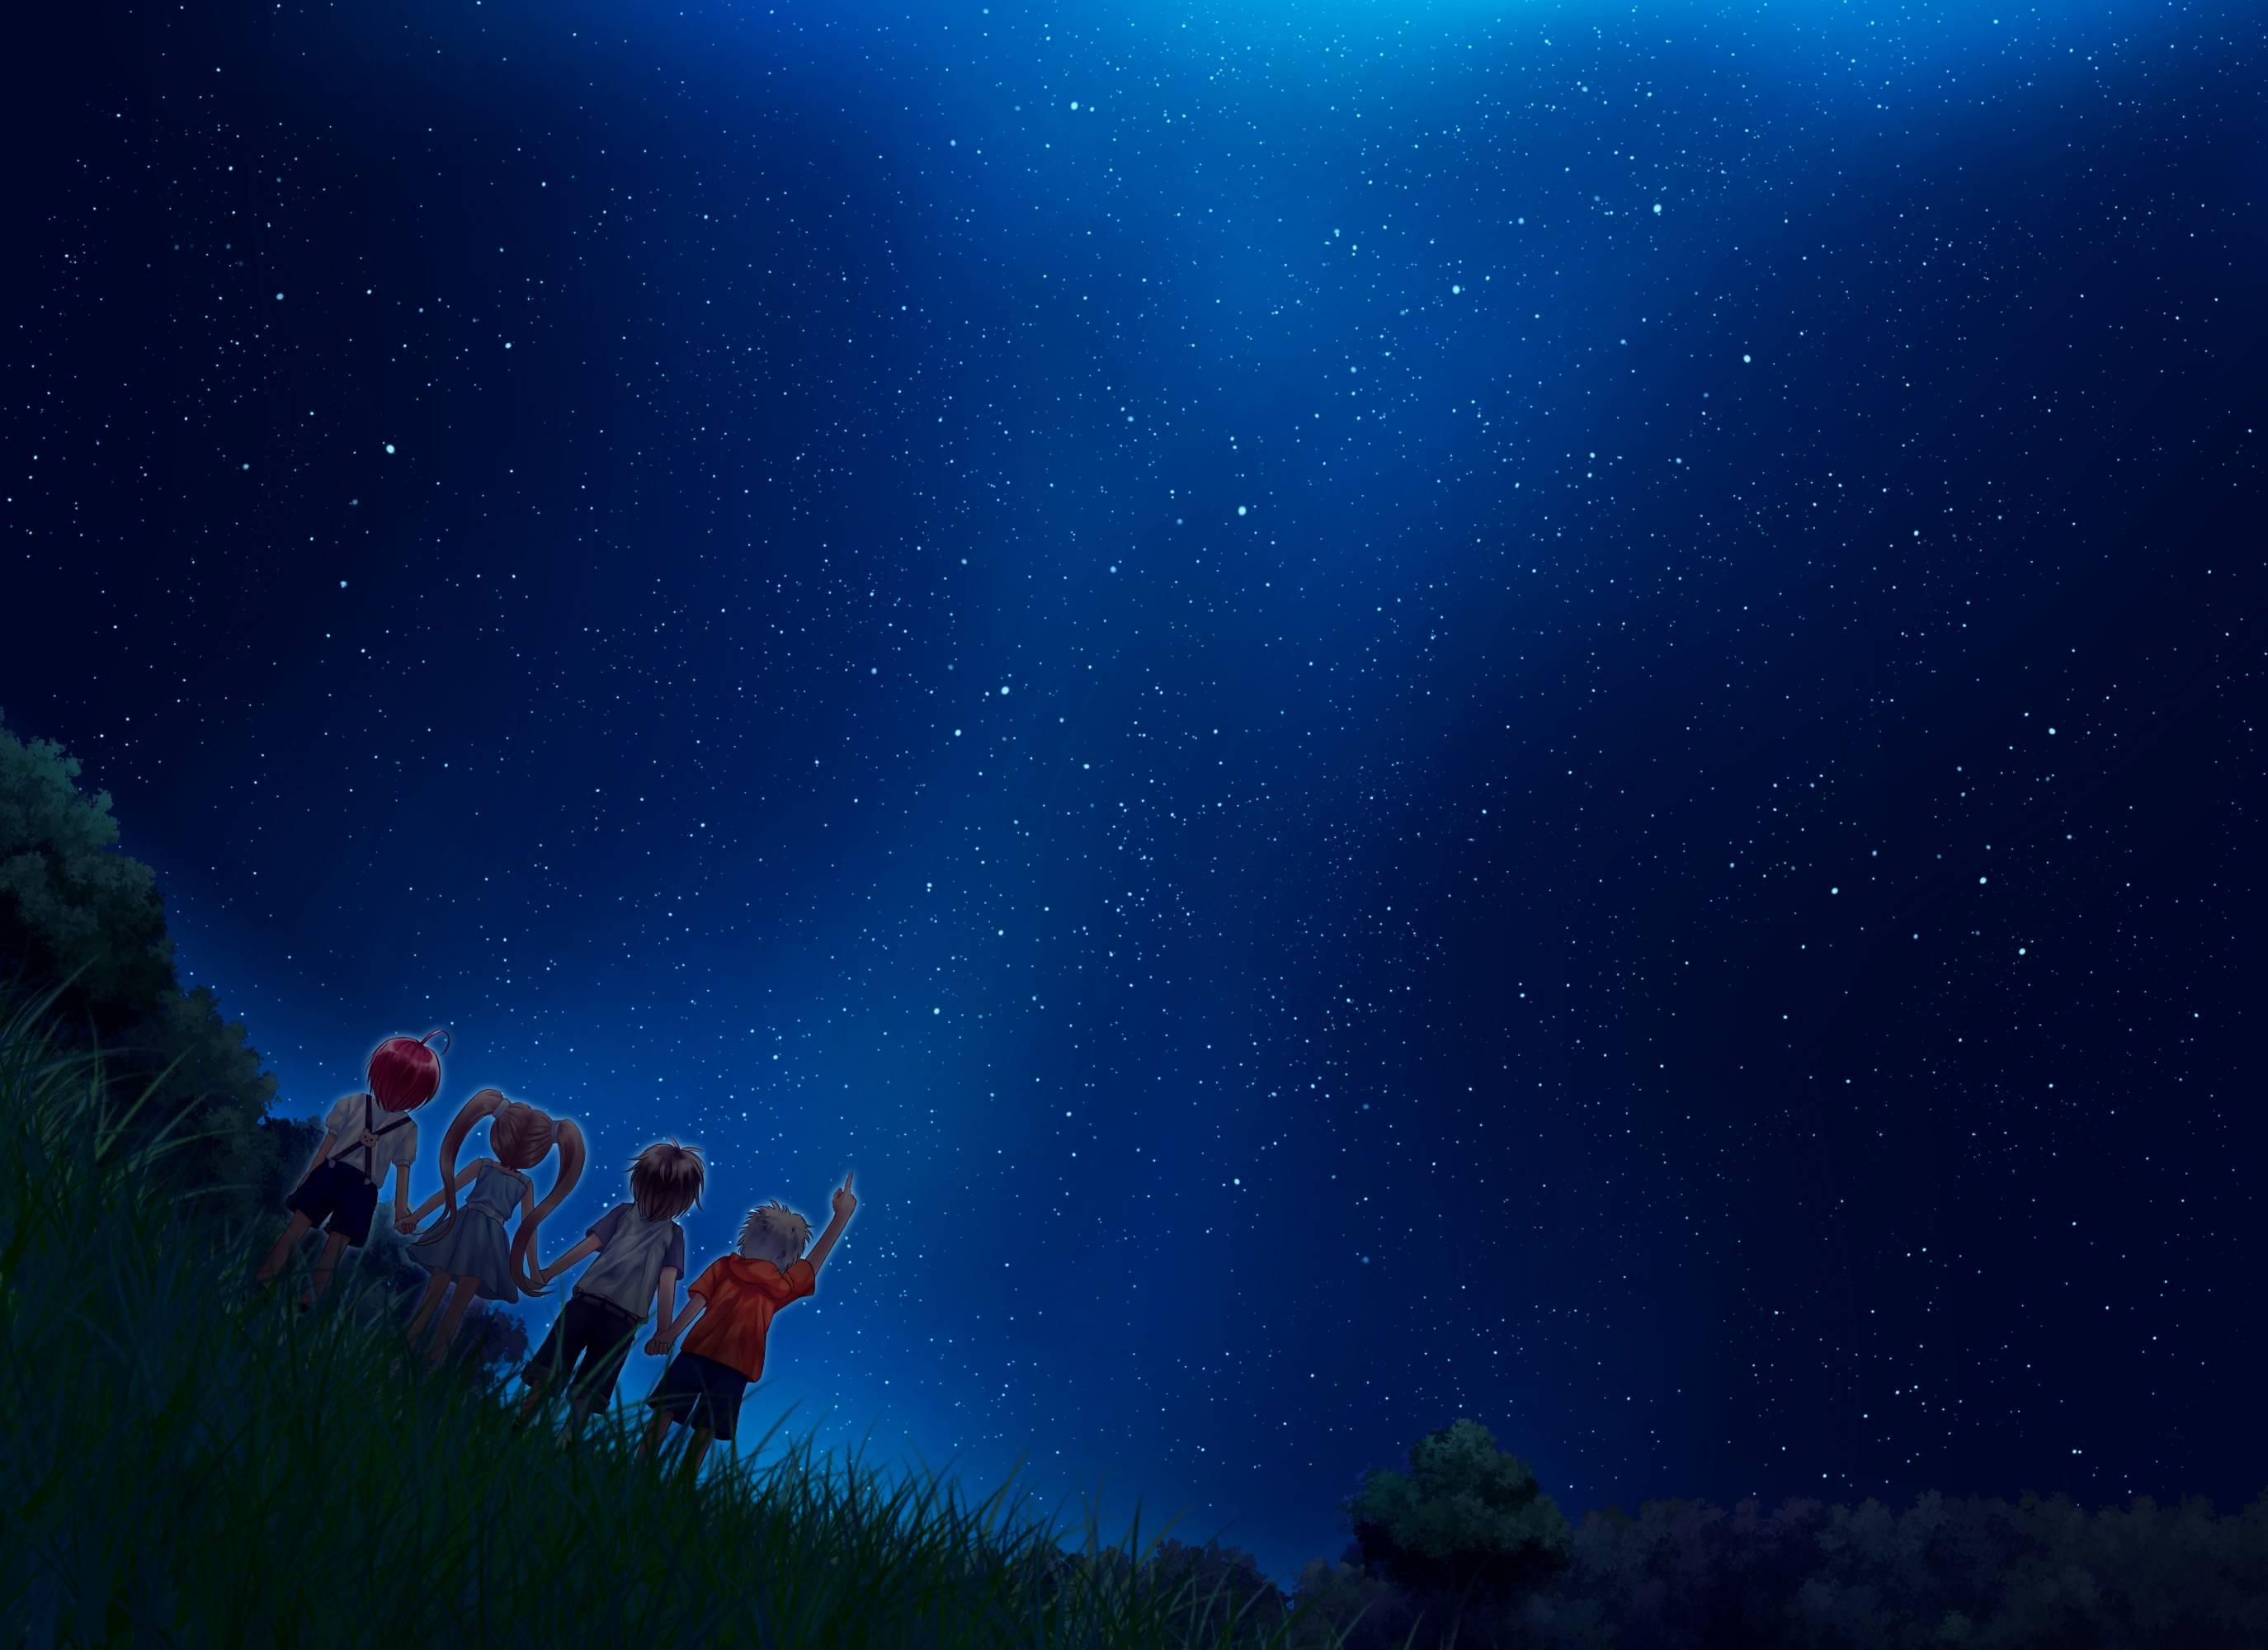 starry night sky wallpaper 1920x1080 MEMEs 2749x2000